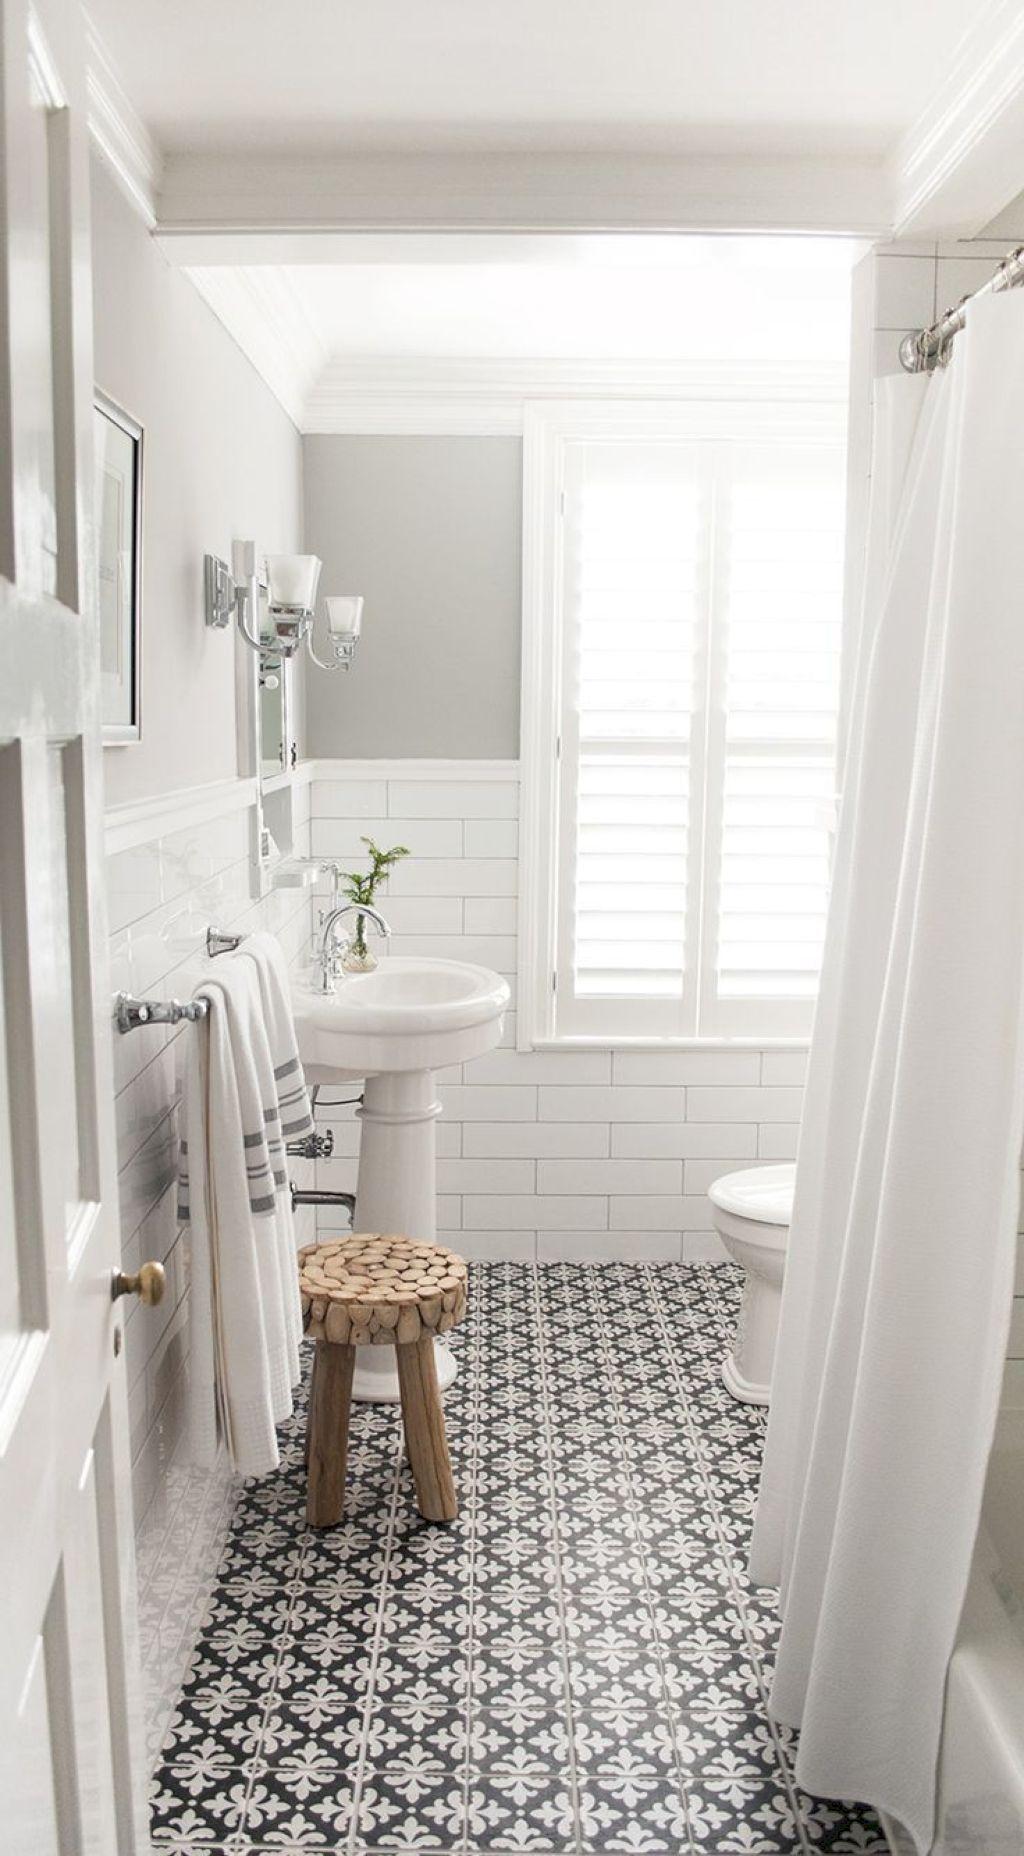 60 Small Bathroom Remodel Ideas | Small bathrooms, Small bathroom ...